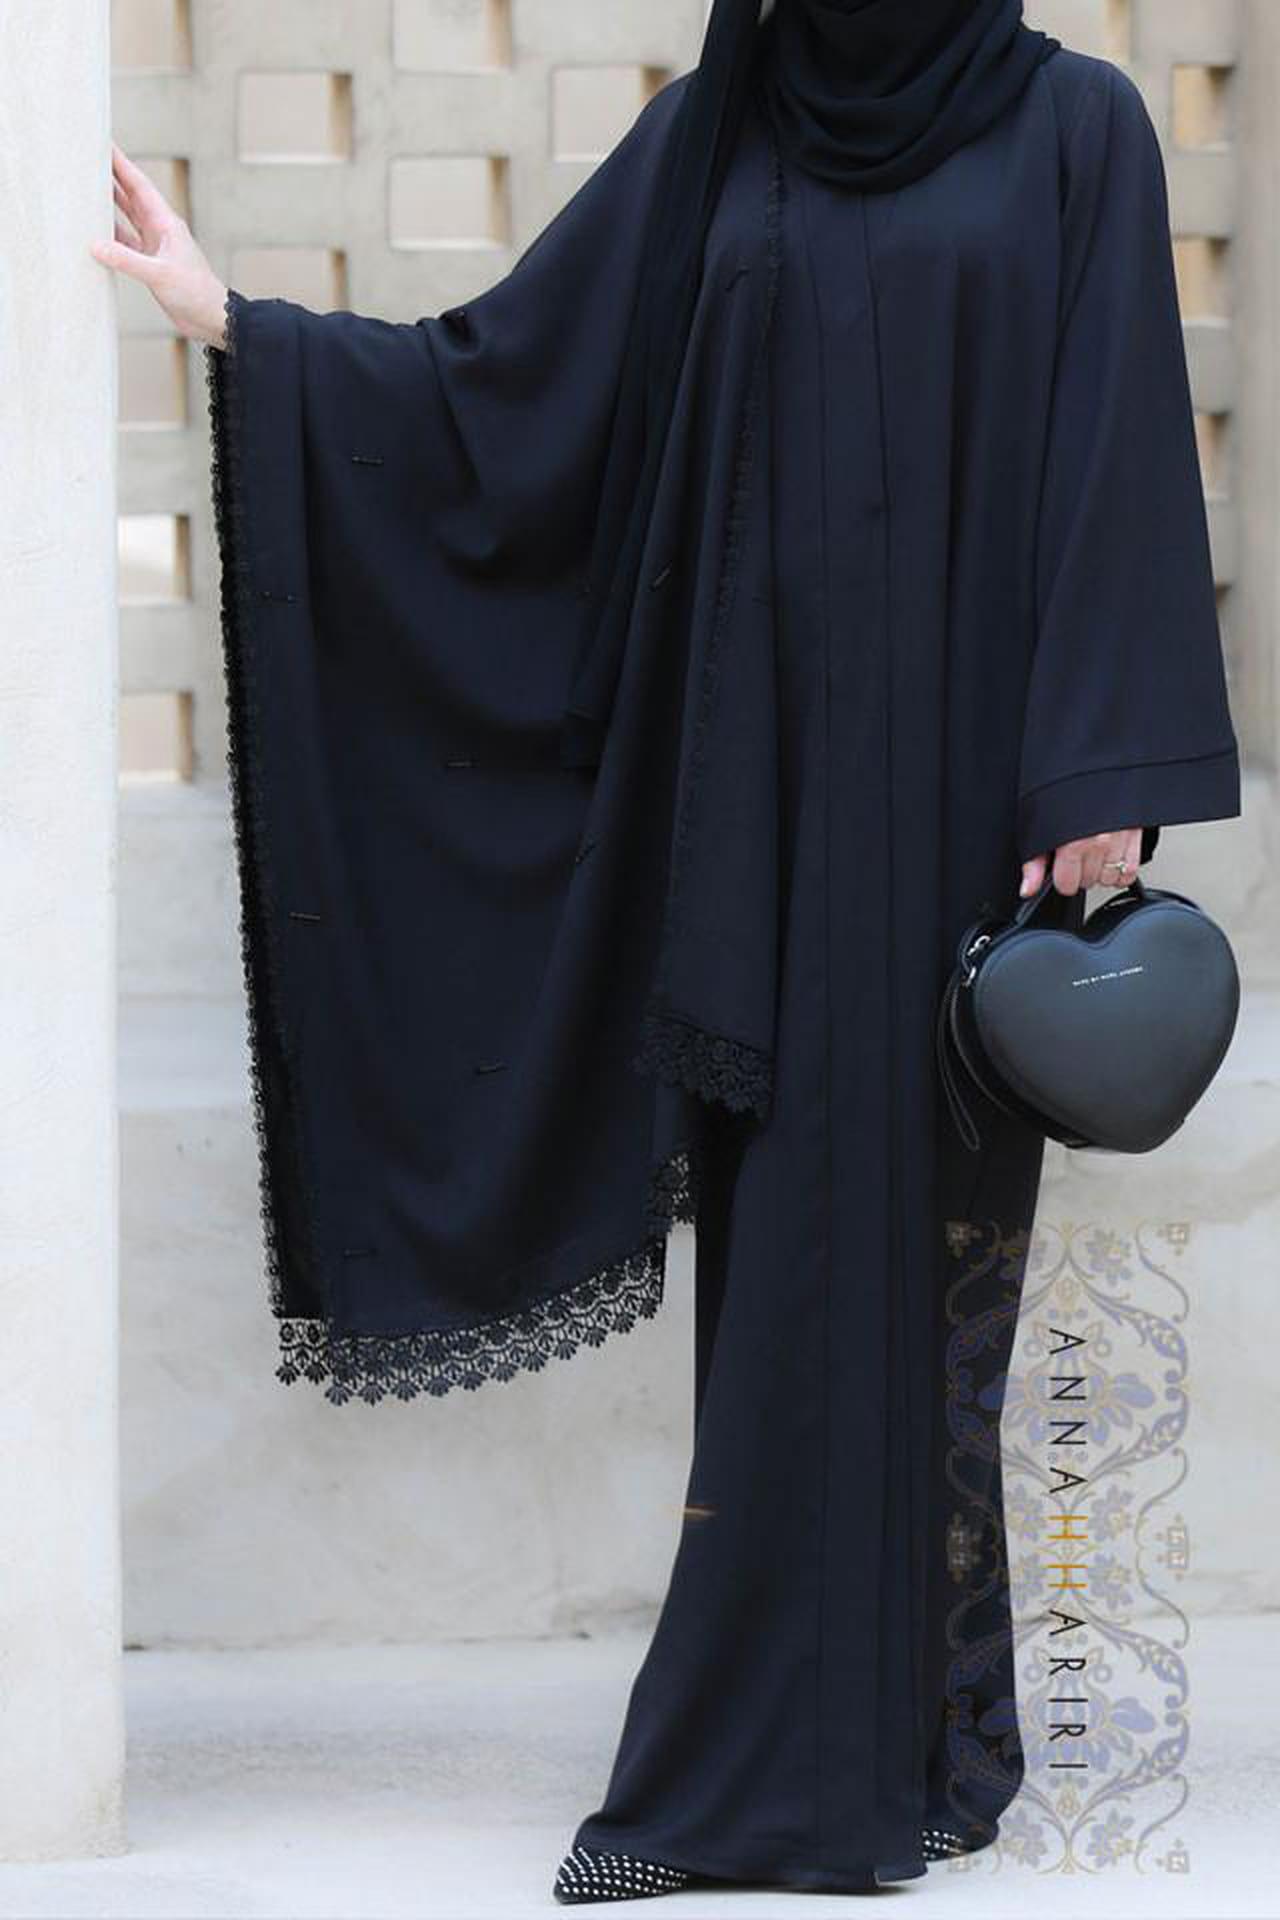 0cf69599c تعنى العلامة التجارية هناء الحريري بتوفير ملابس ممتازة بتصاميم رائعة وعالية  الجودة للمرأة المسلمة العصرية.